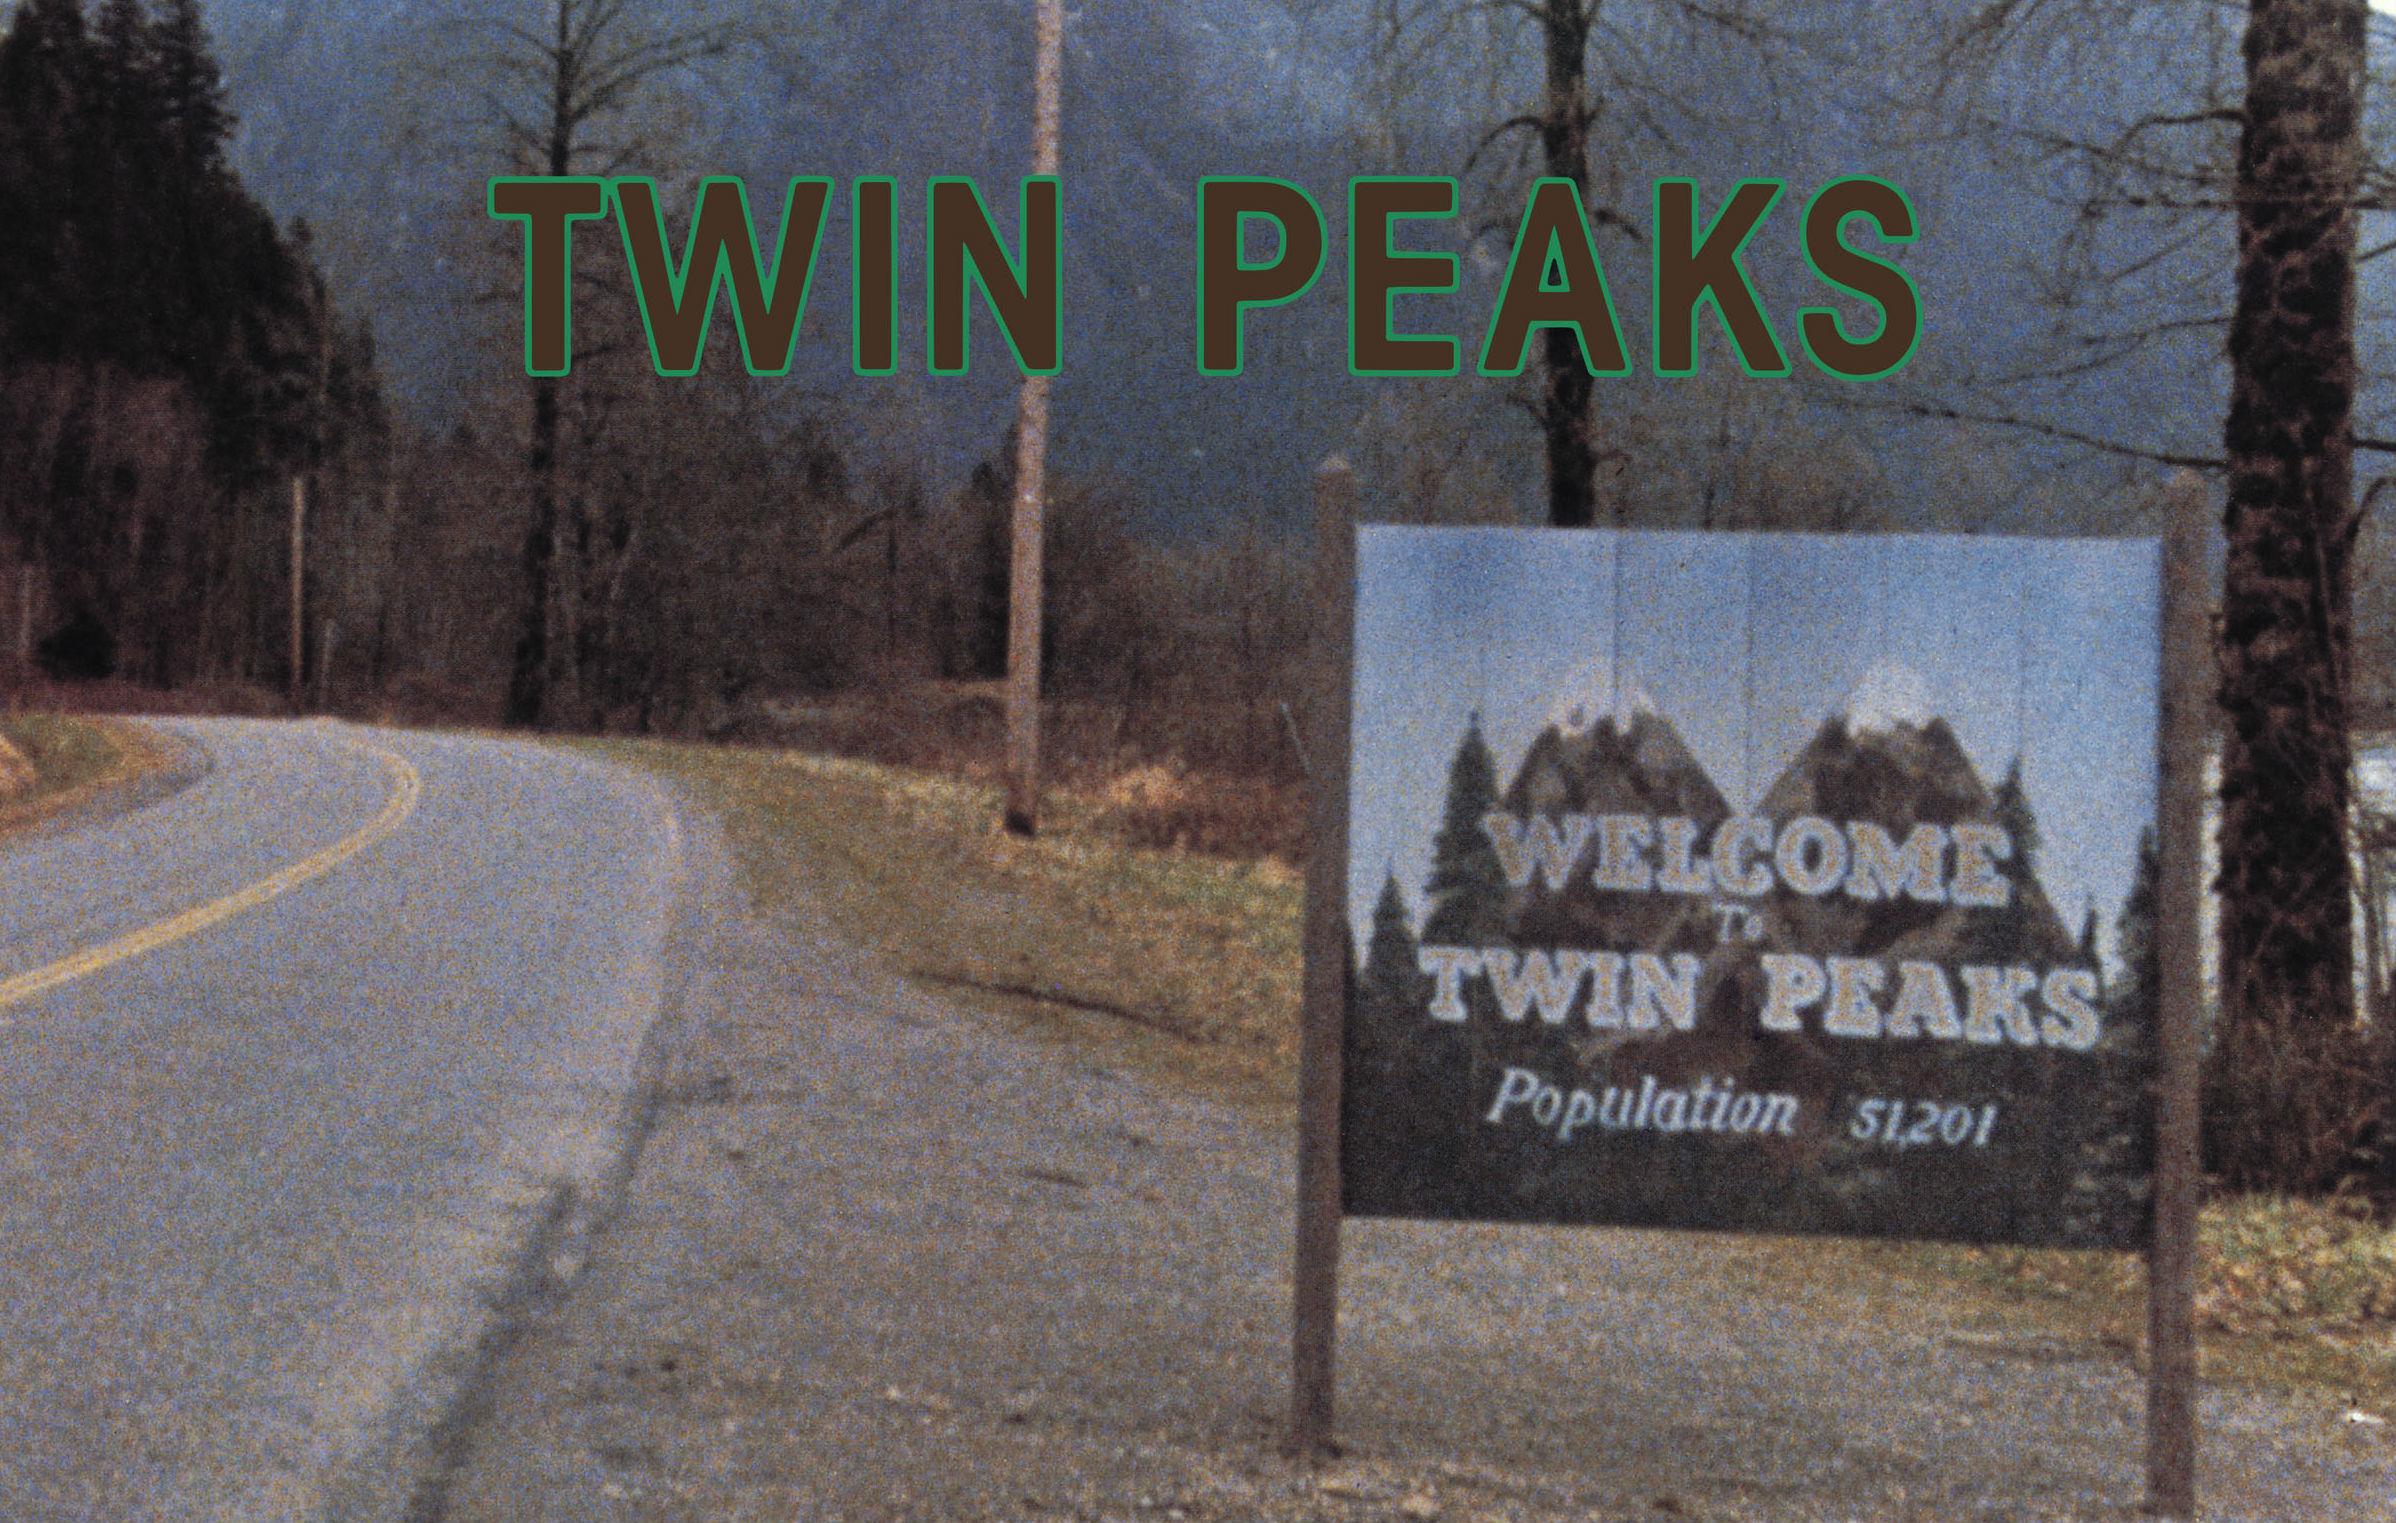 Original Twin Peaks Soundtracks To Be Reissued On Vinyl